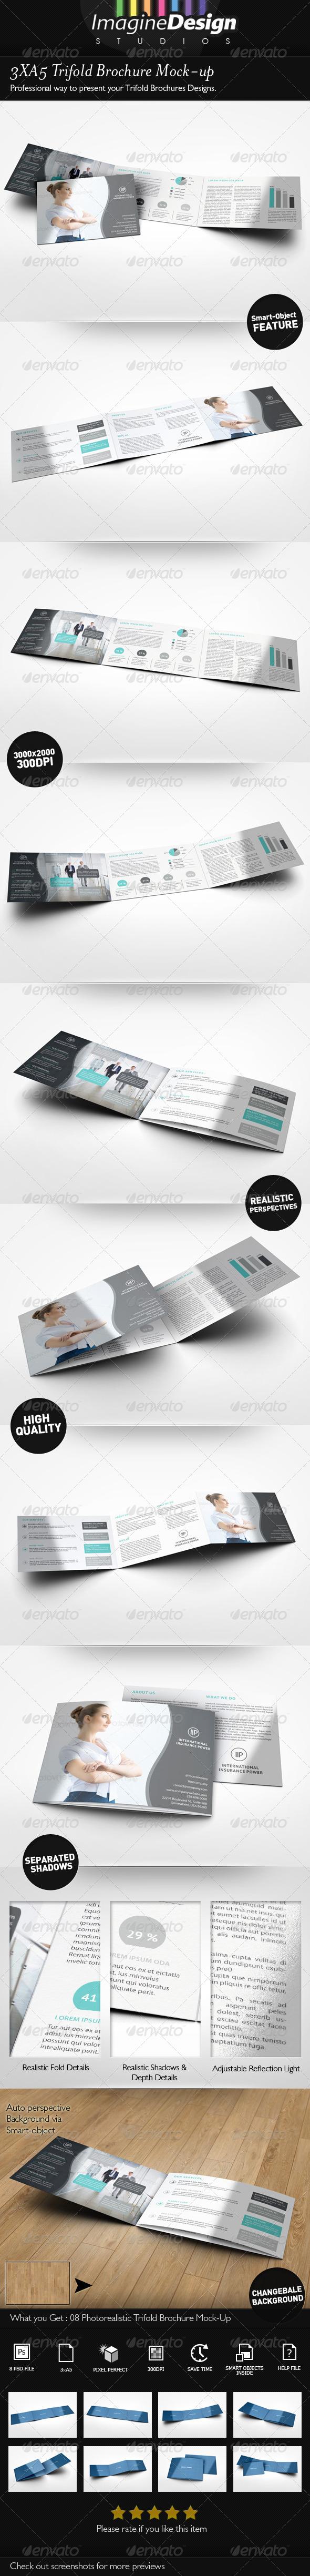 3xA5 Trifold Brochure Mock-up Landscape - Brochures Print